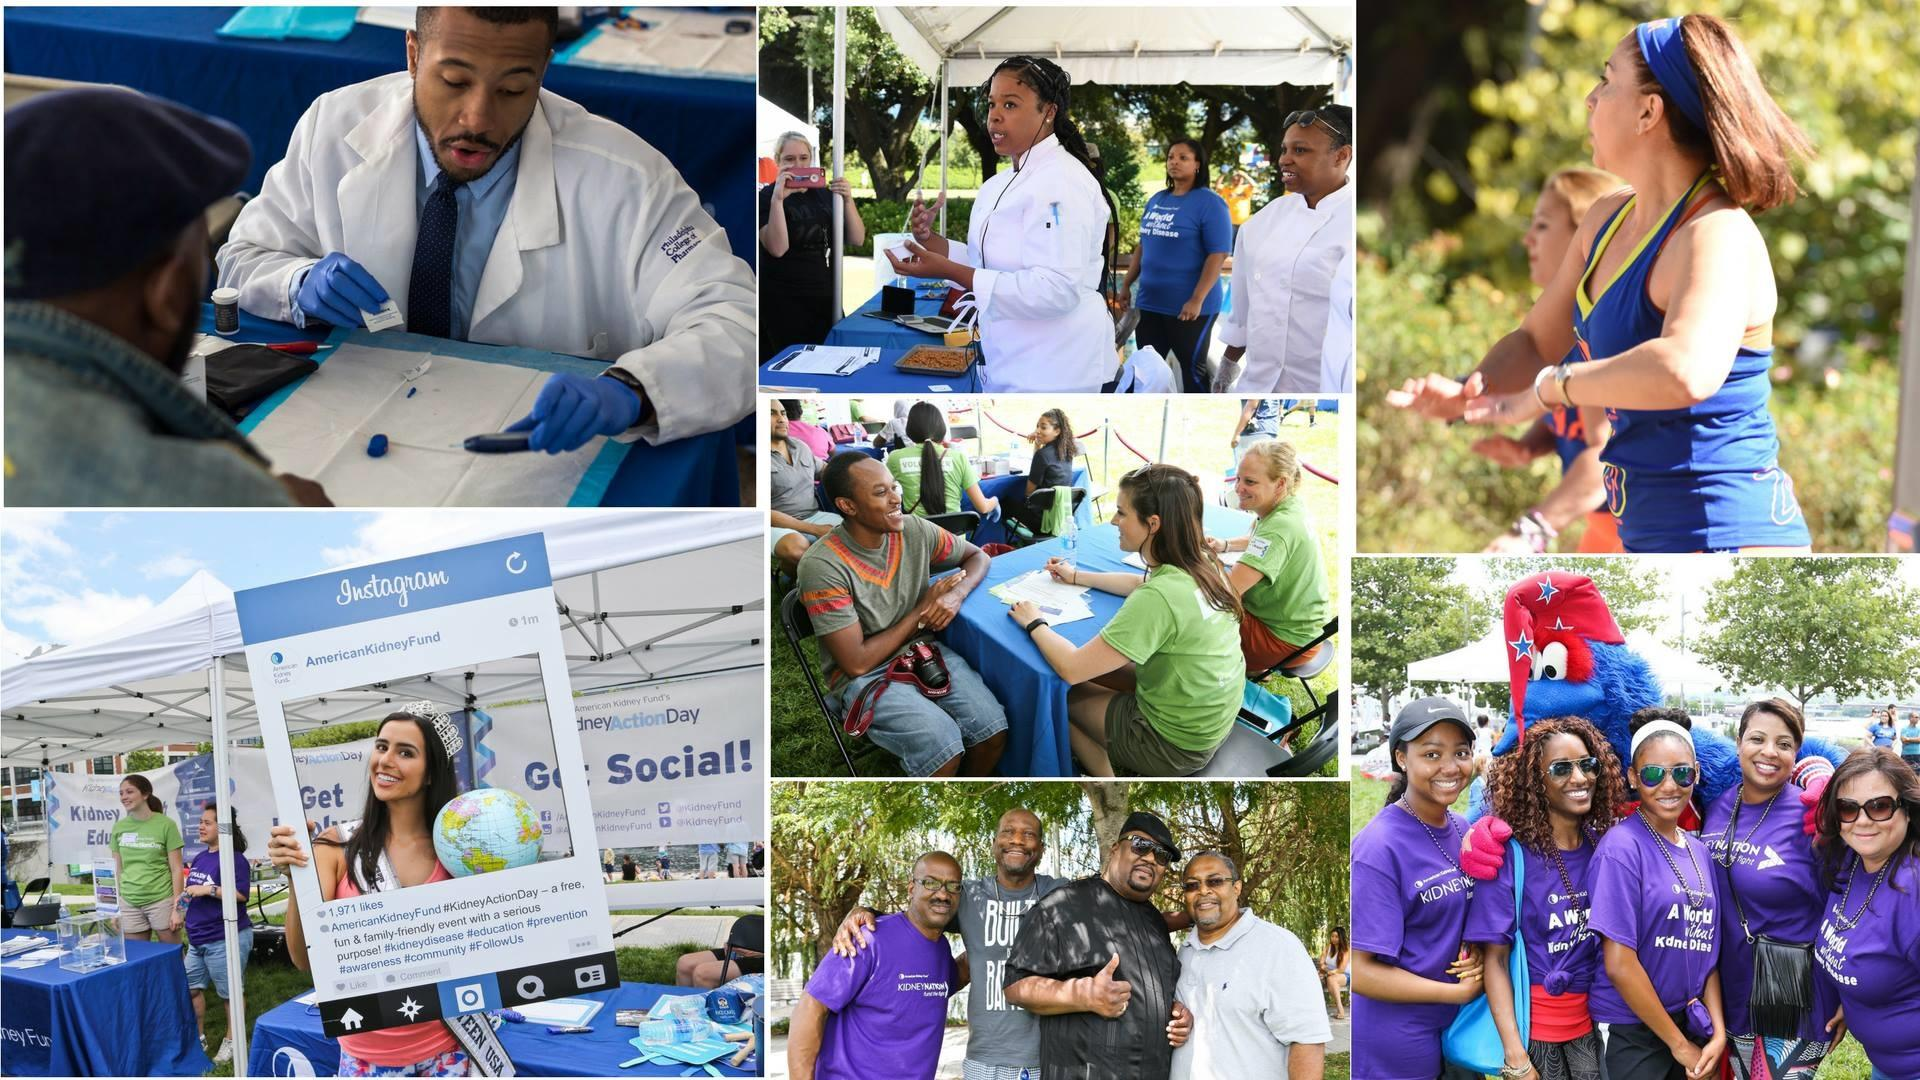 San Jose Kidney Action Day